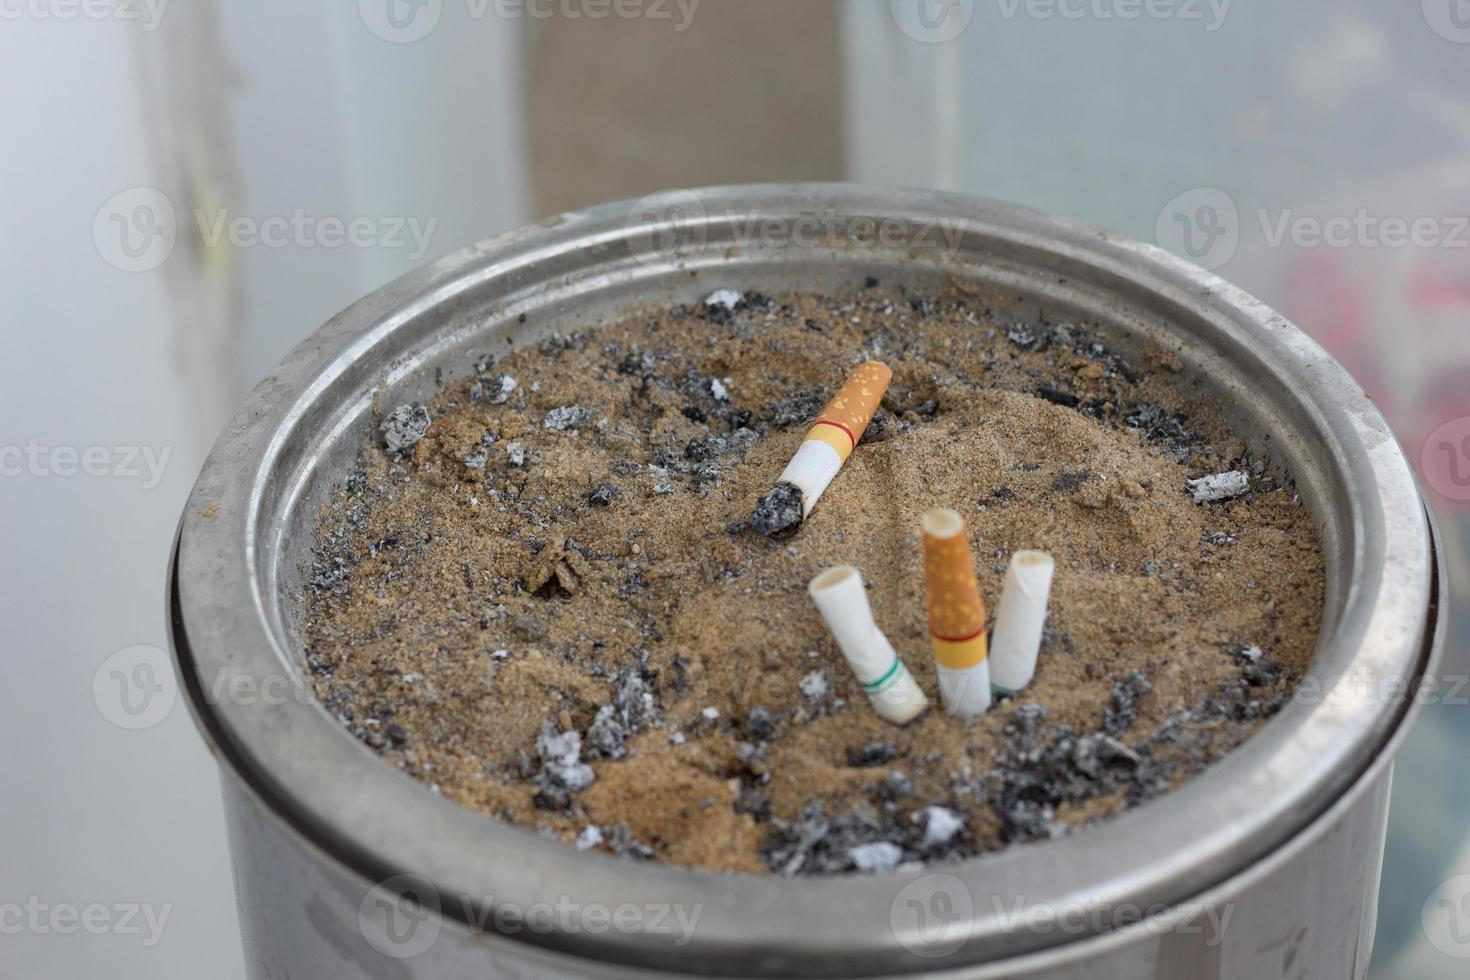 asbak met sigaret foto